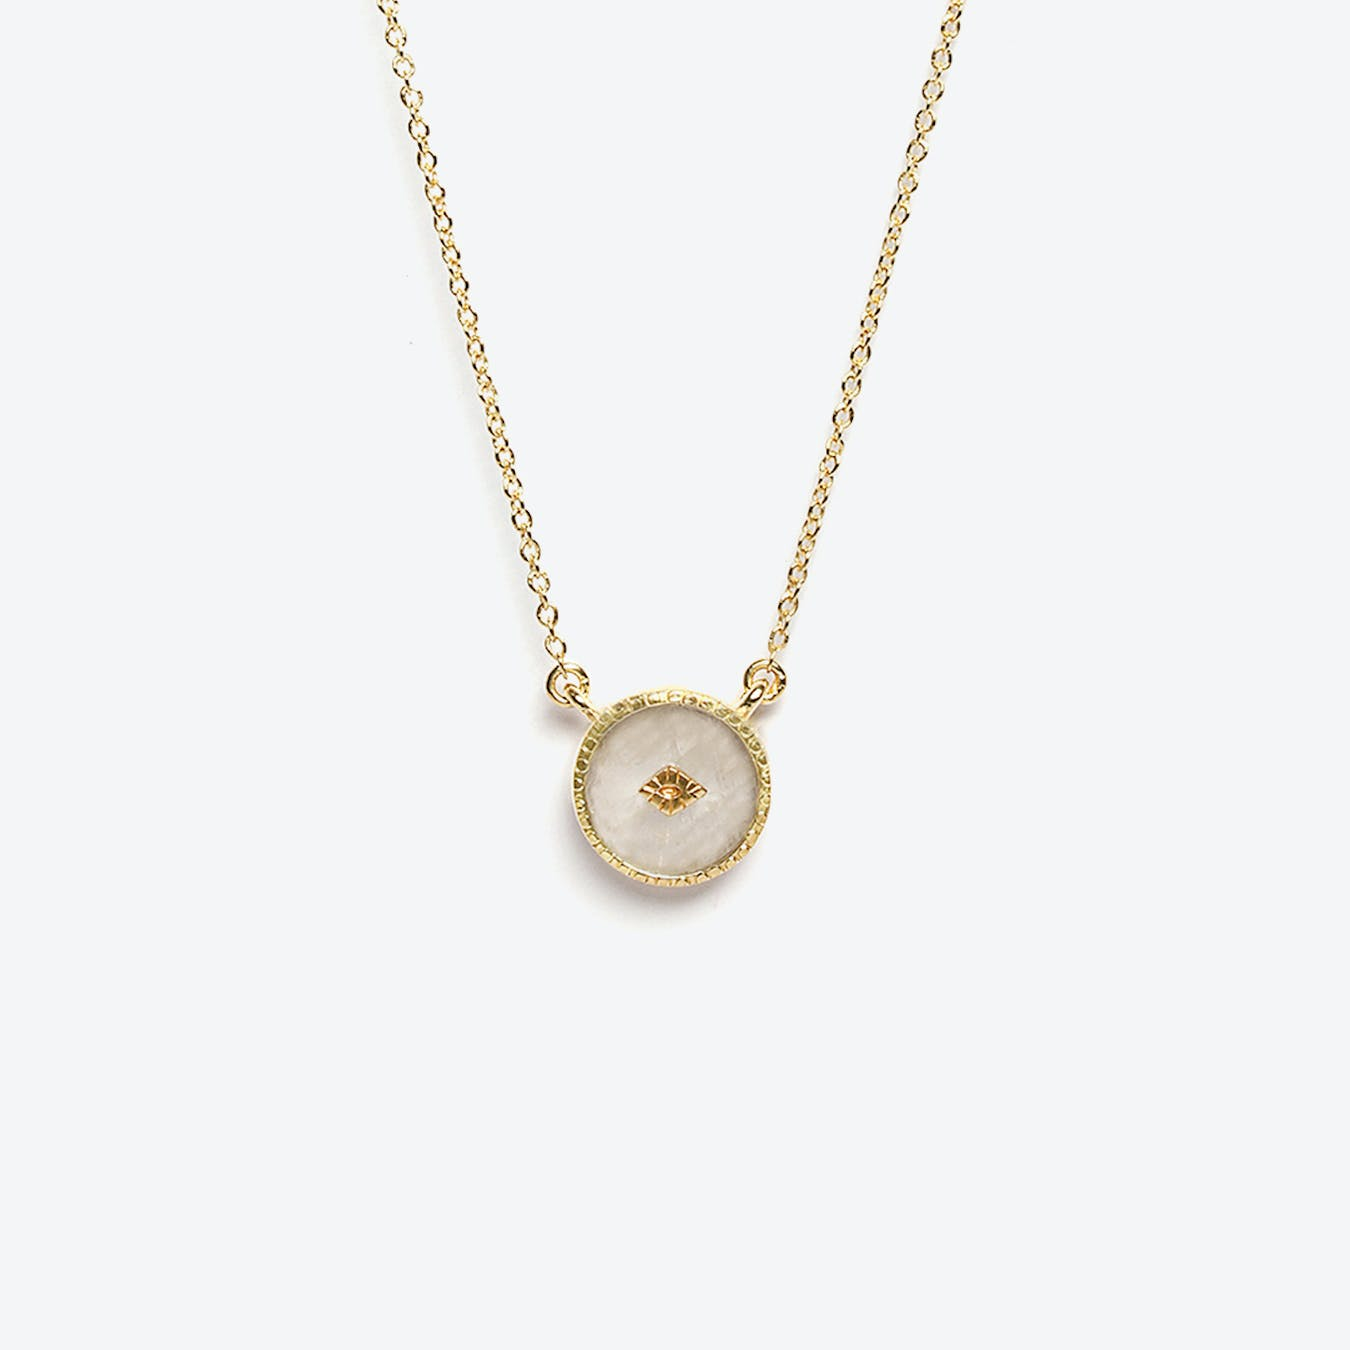 Sanja Necklace - Moonstone